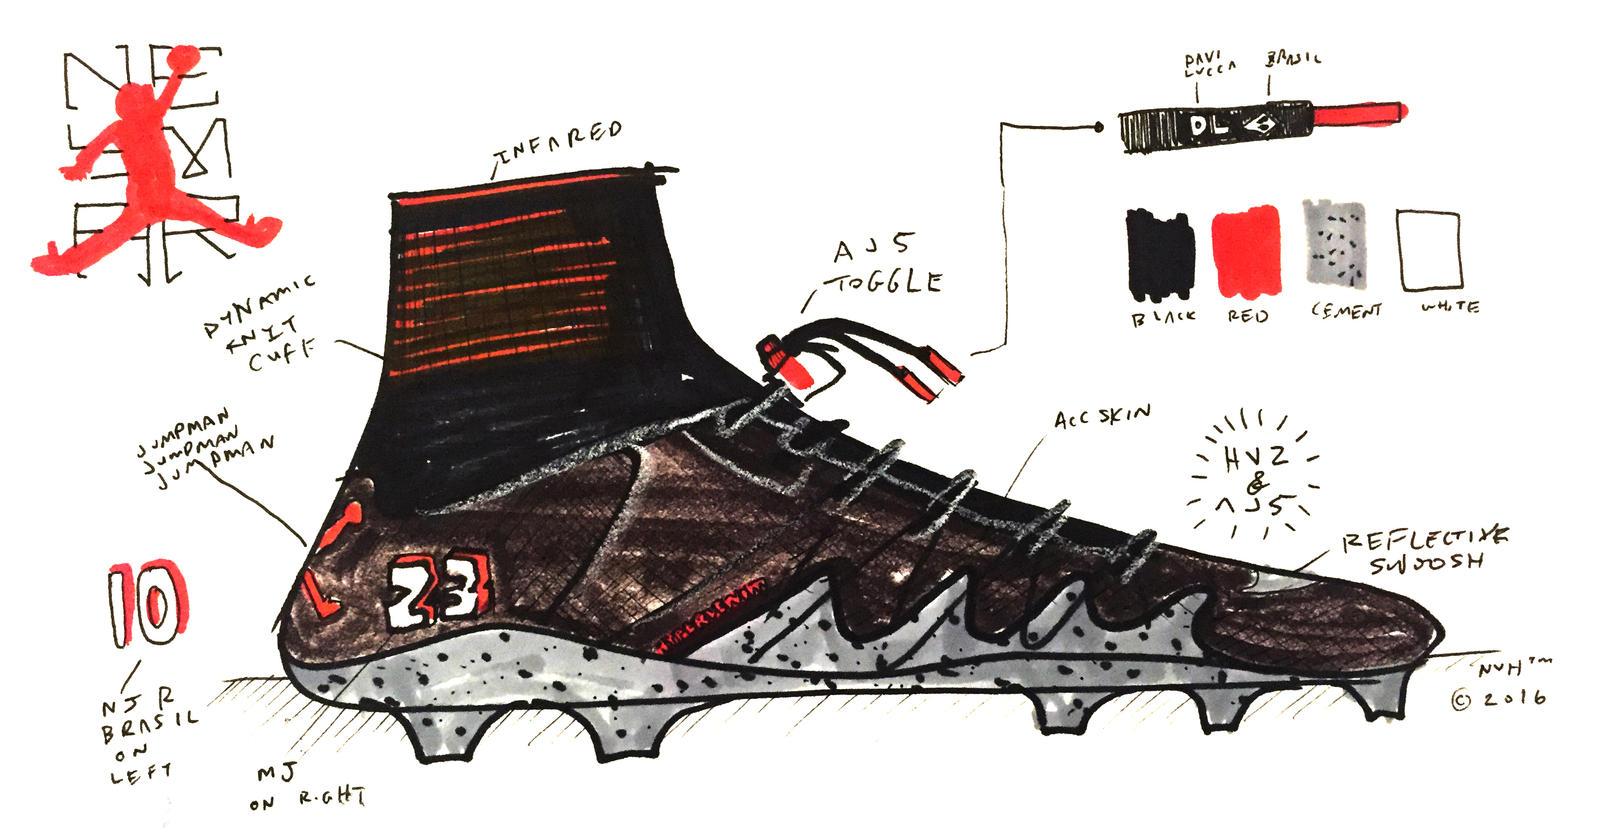 competitive price db890 f4254 Nike Introduces the NJR x Jordan Collection | Kickspotting